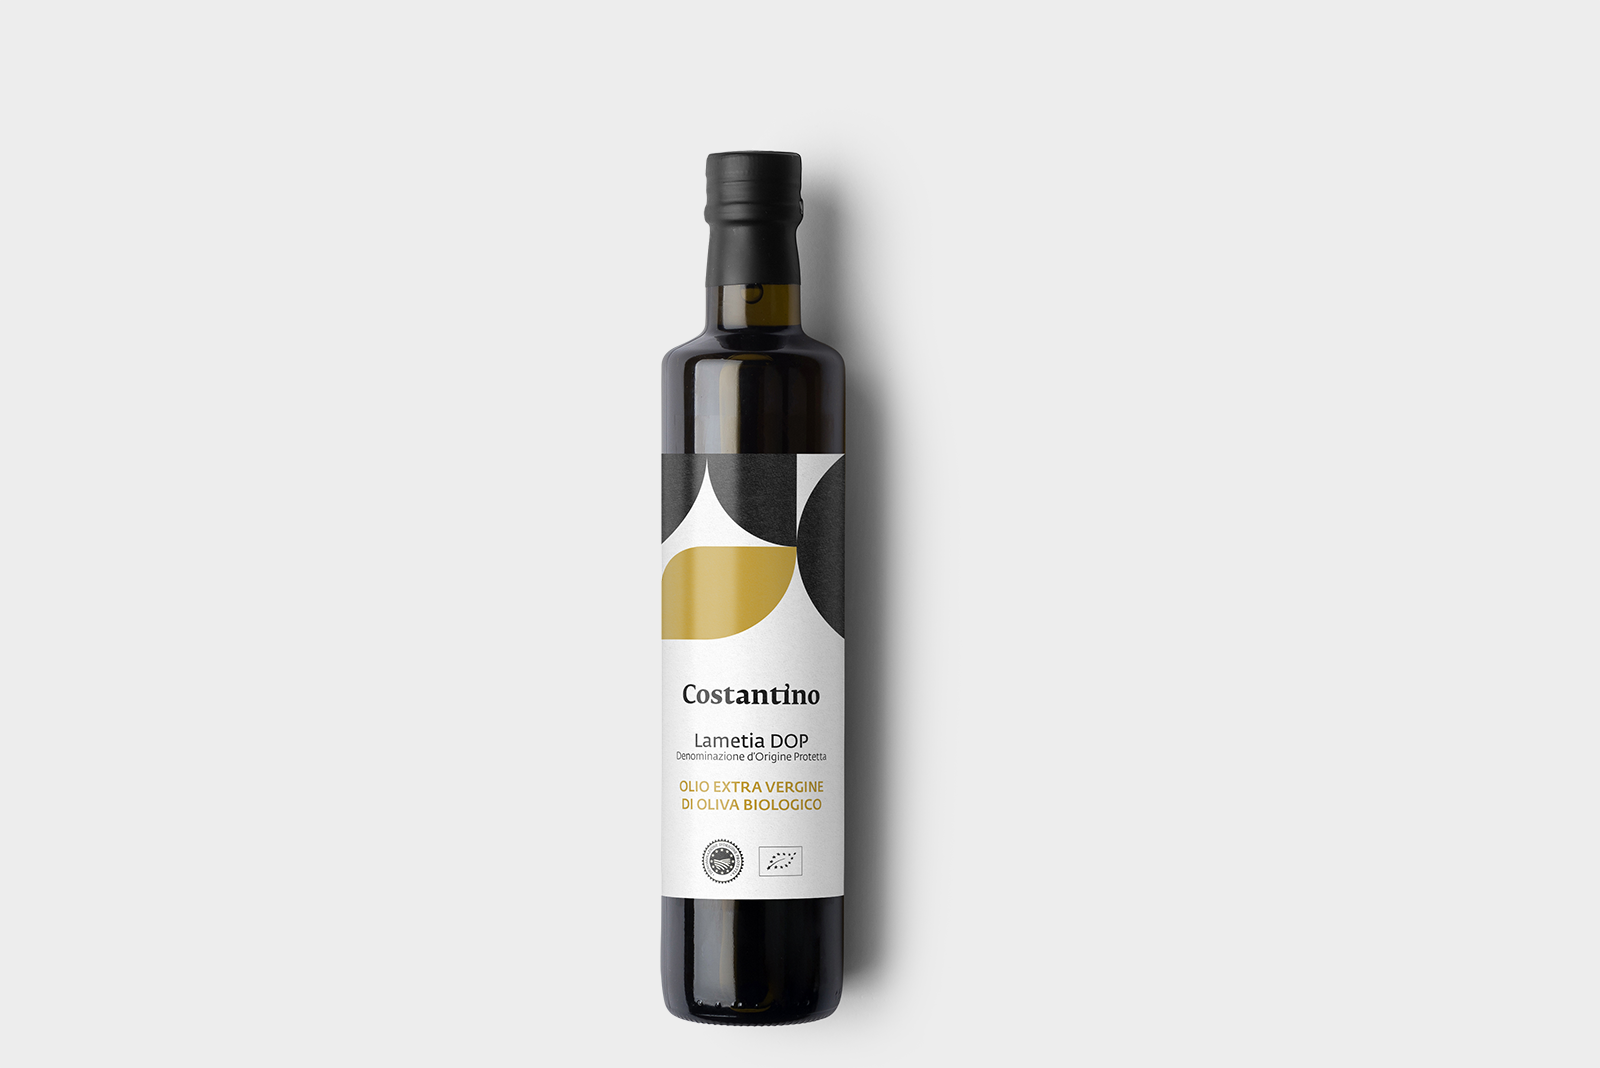 Costantino - Olio Extra Vergine d'Oliva Biologico Dop Lamezia - bottiglia 75cl